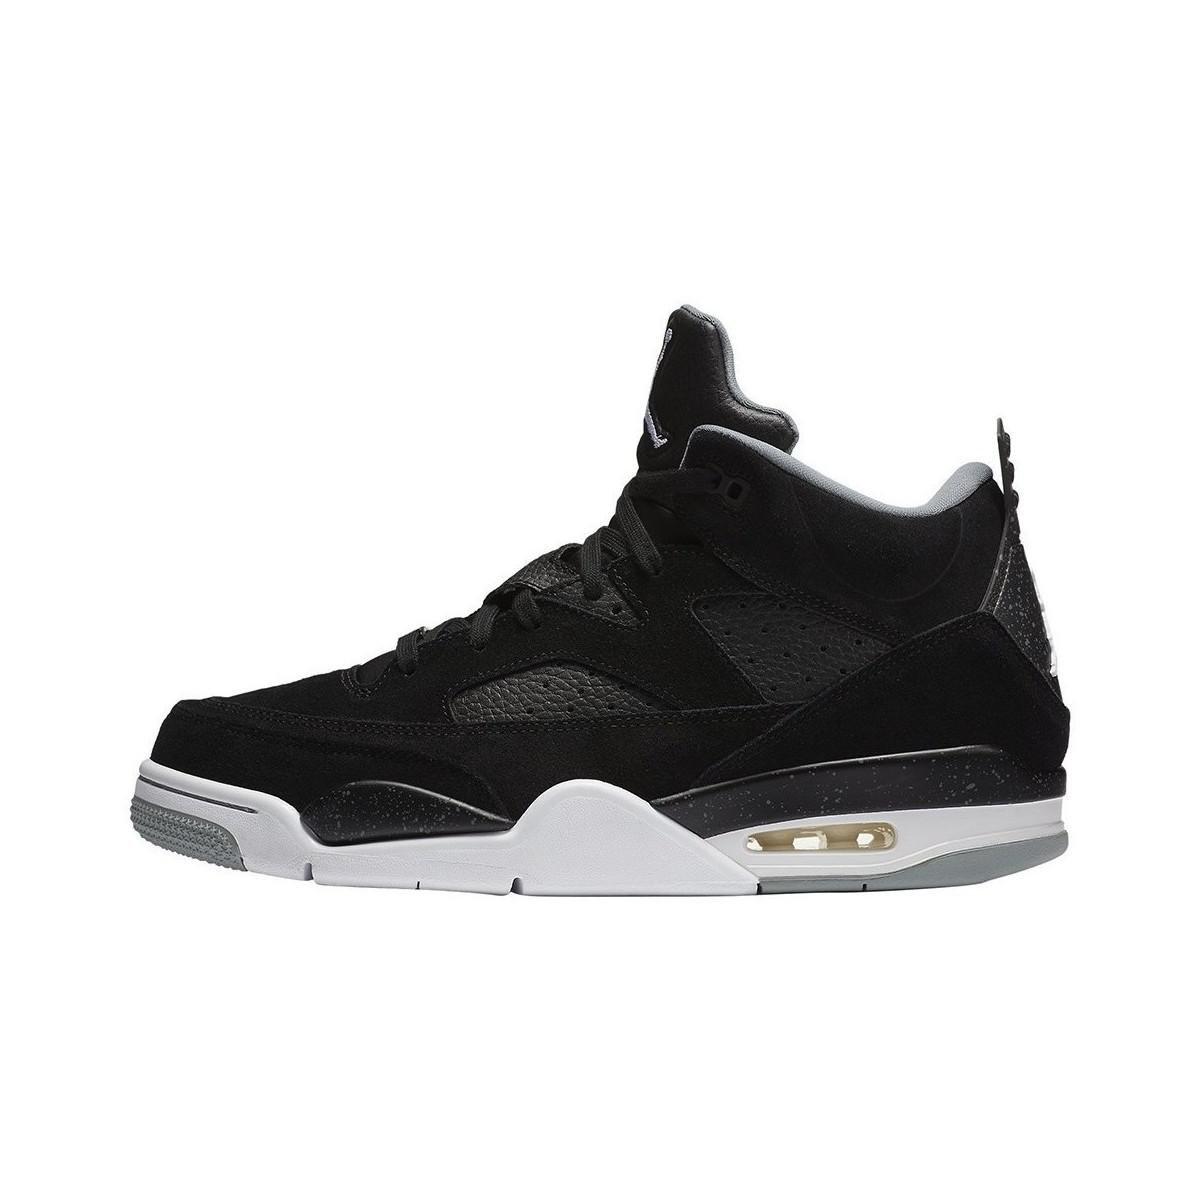 2d42e4973327 Nike - Air Jordan Son Of Mars Men s Shoes (high-top Trainers) In. View  fullscreen